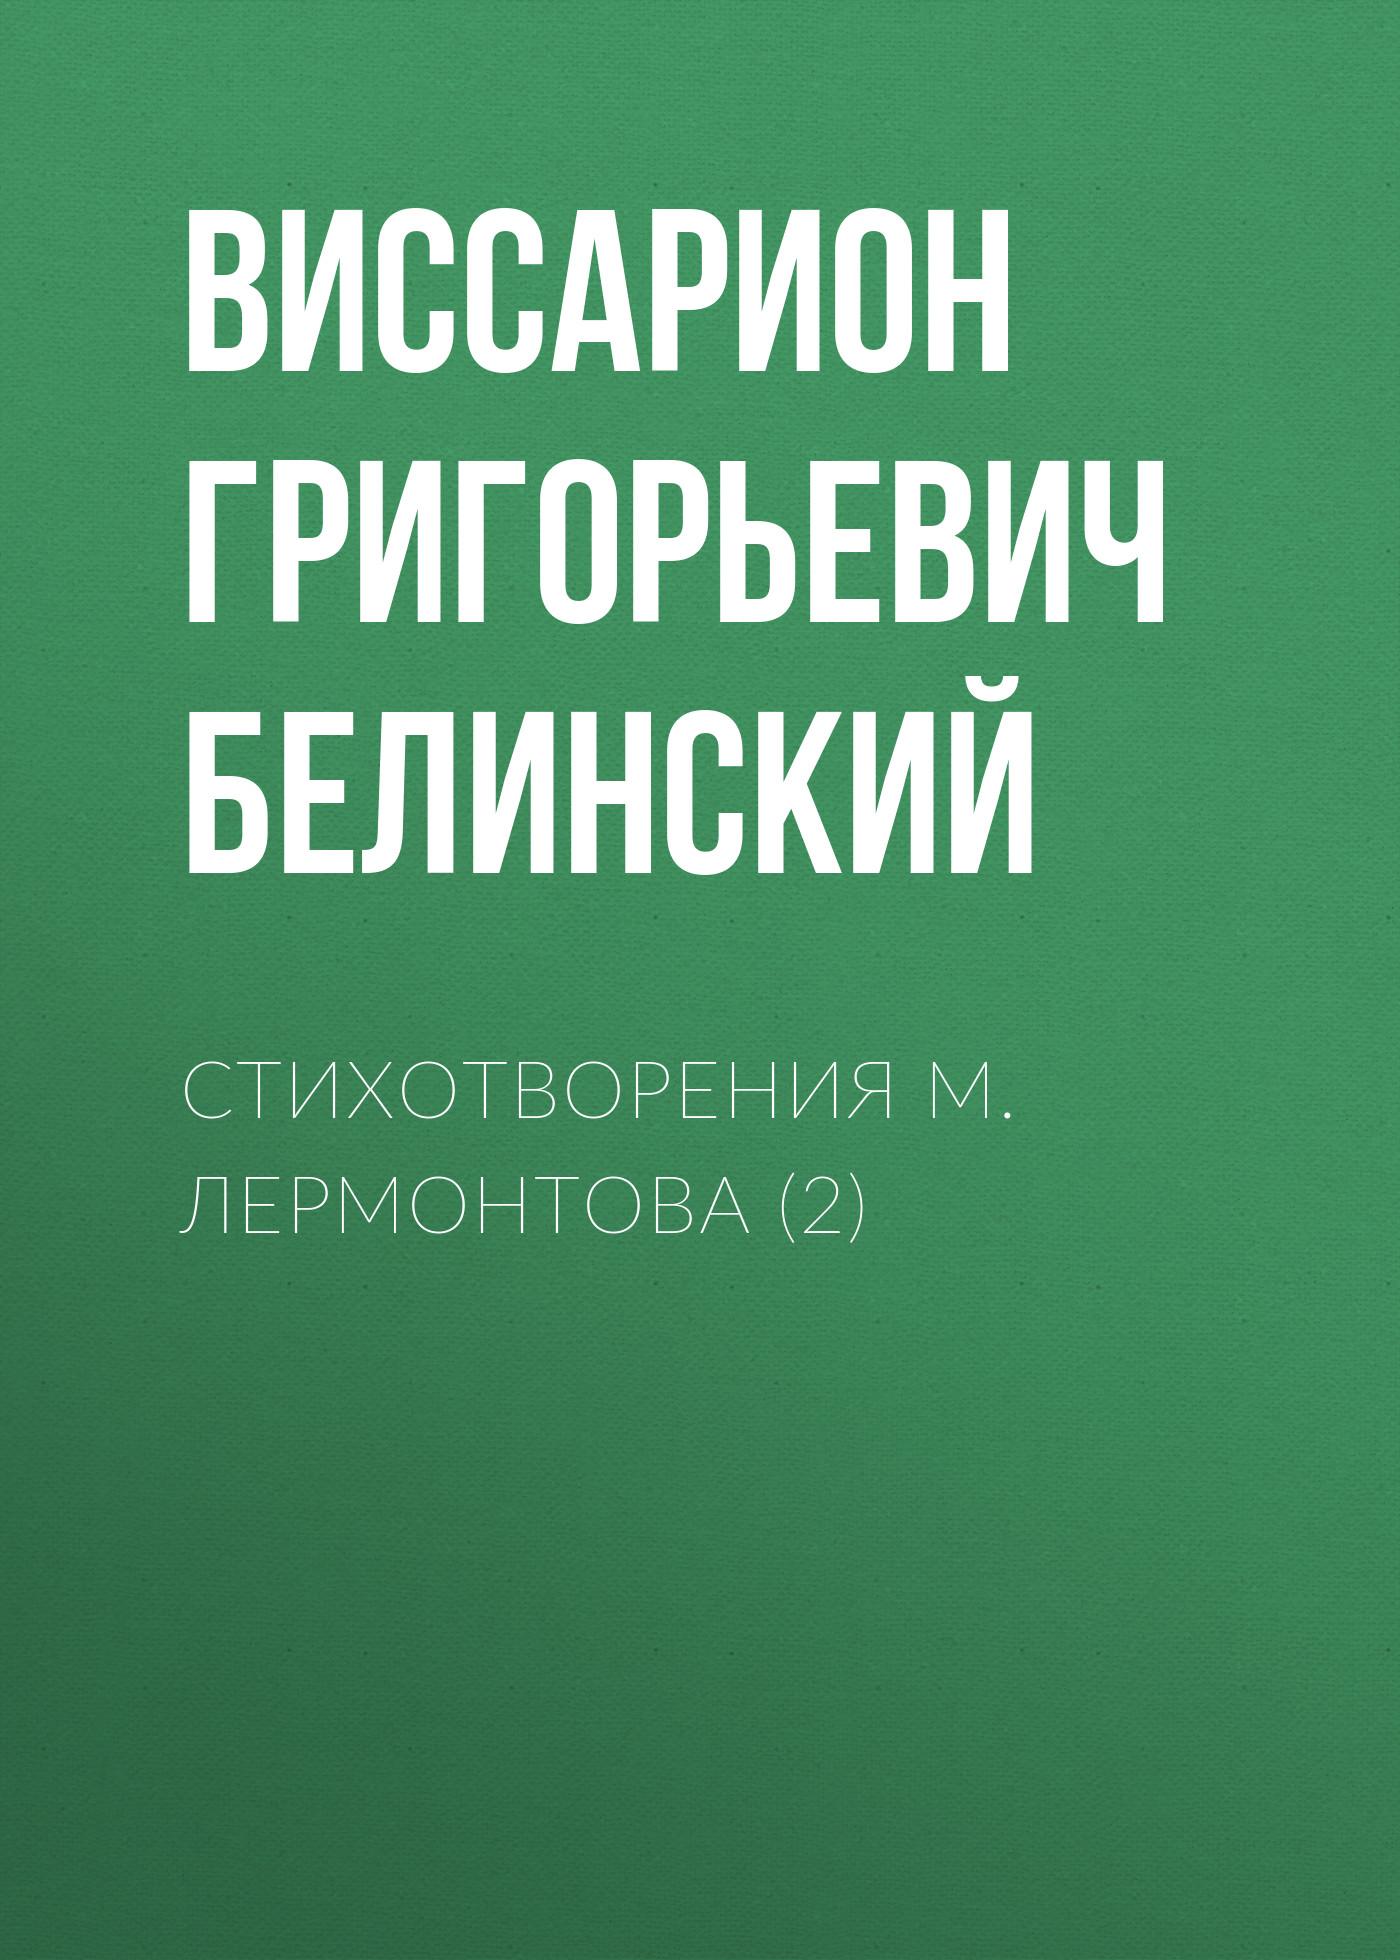 Виссарион Григорьевич Белинский Стихотворения М. Лермонтова (2) виссарион григорьевич белинский сельское чтение…